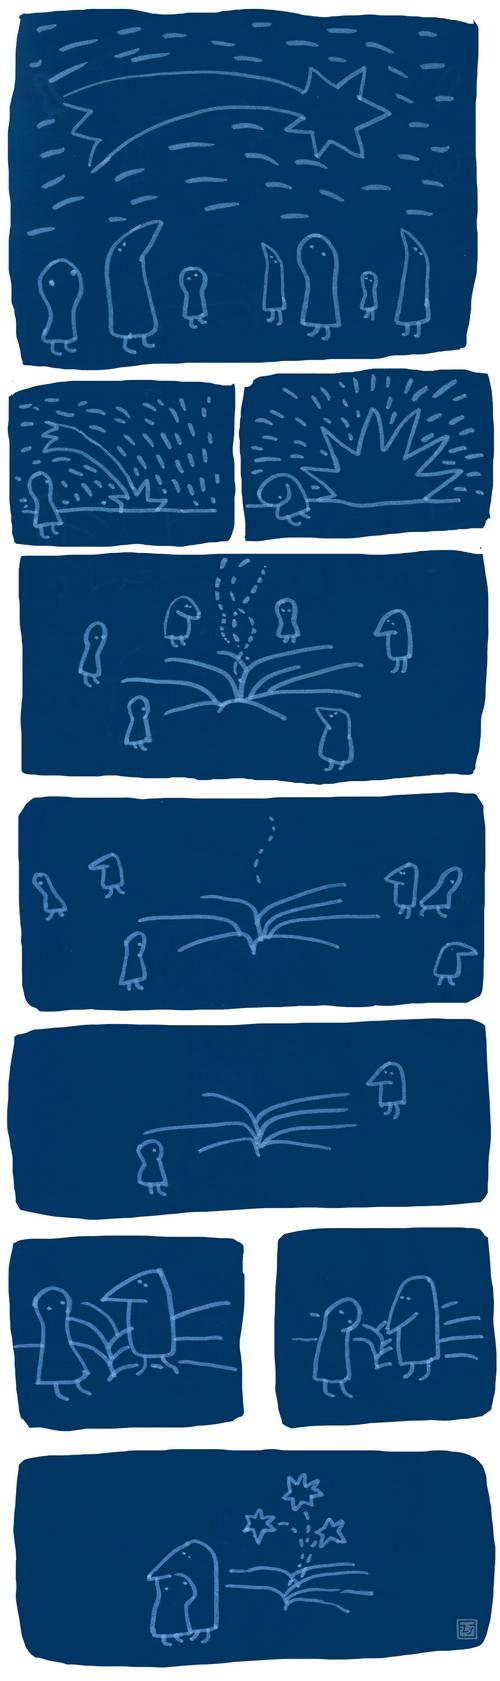 Носатые: Комета (комикс)